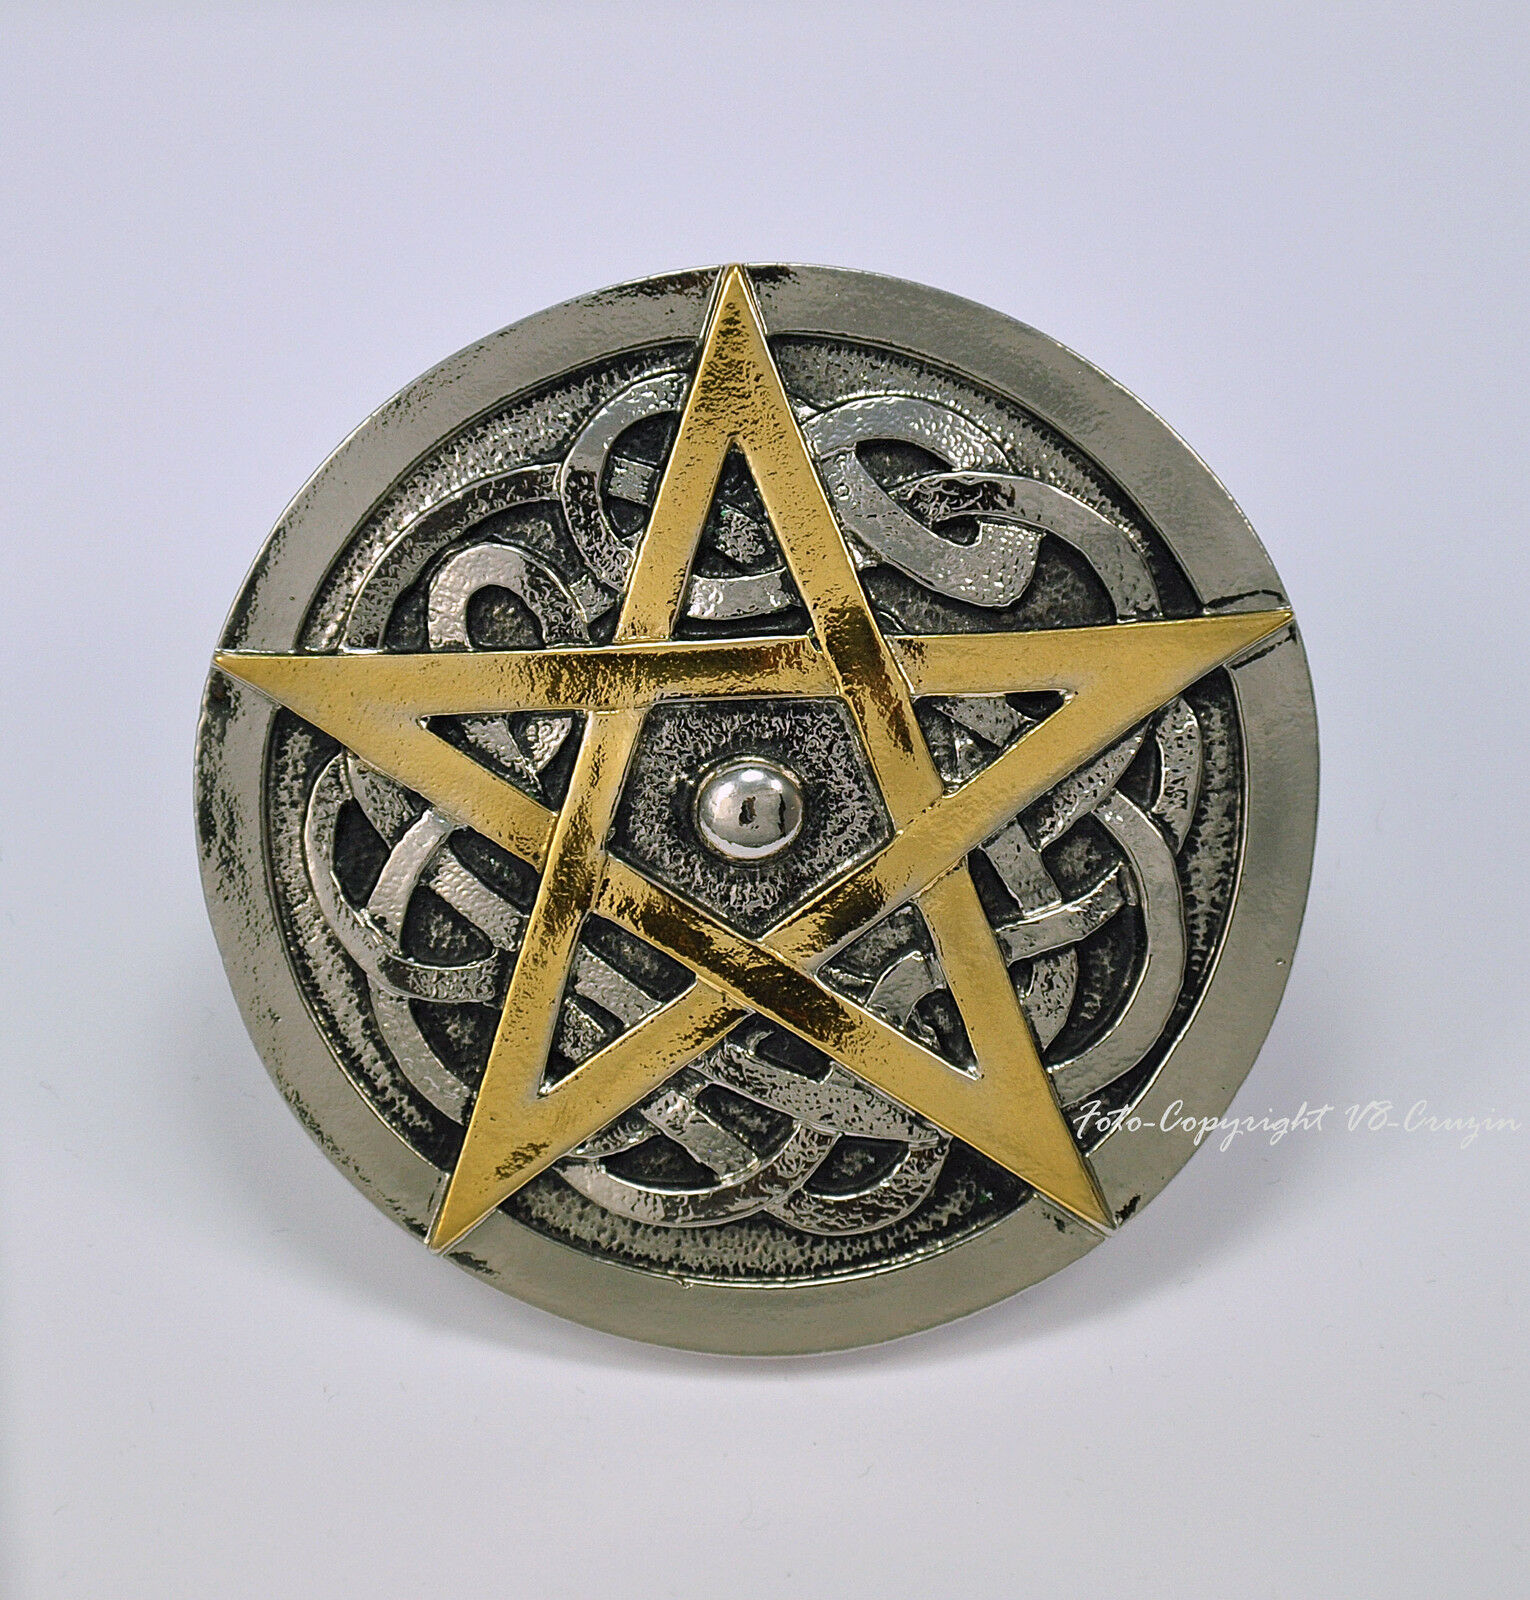 * Pentagramm Belt Buckle Kelten Mittelalter Gotik Fantasy Gürtelschnalle * 486